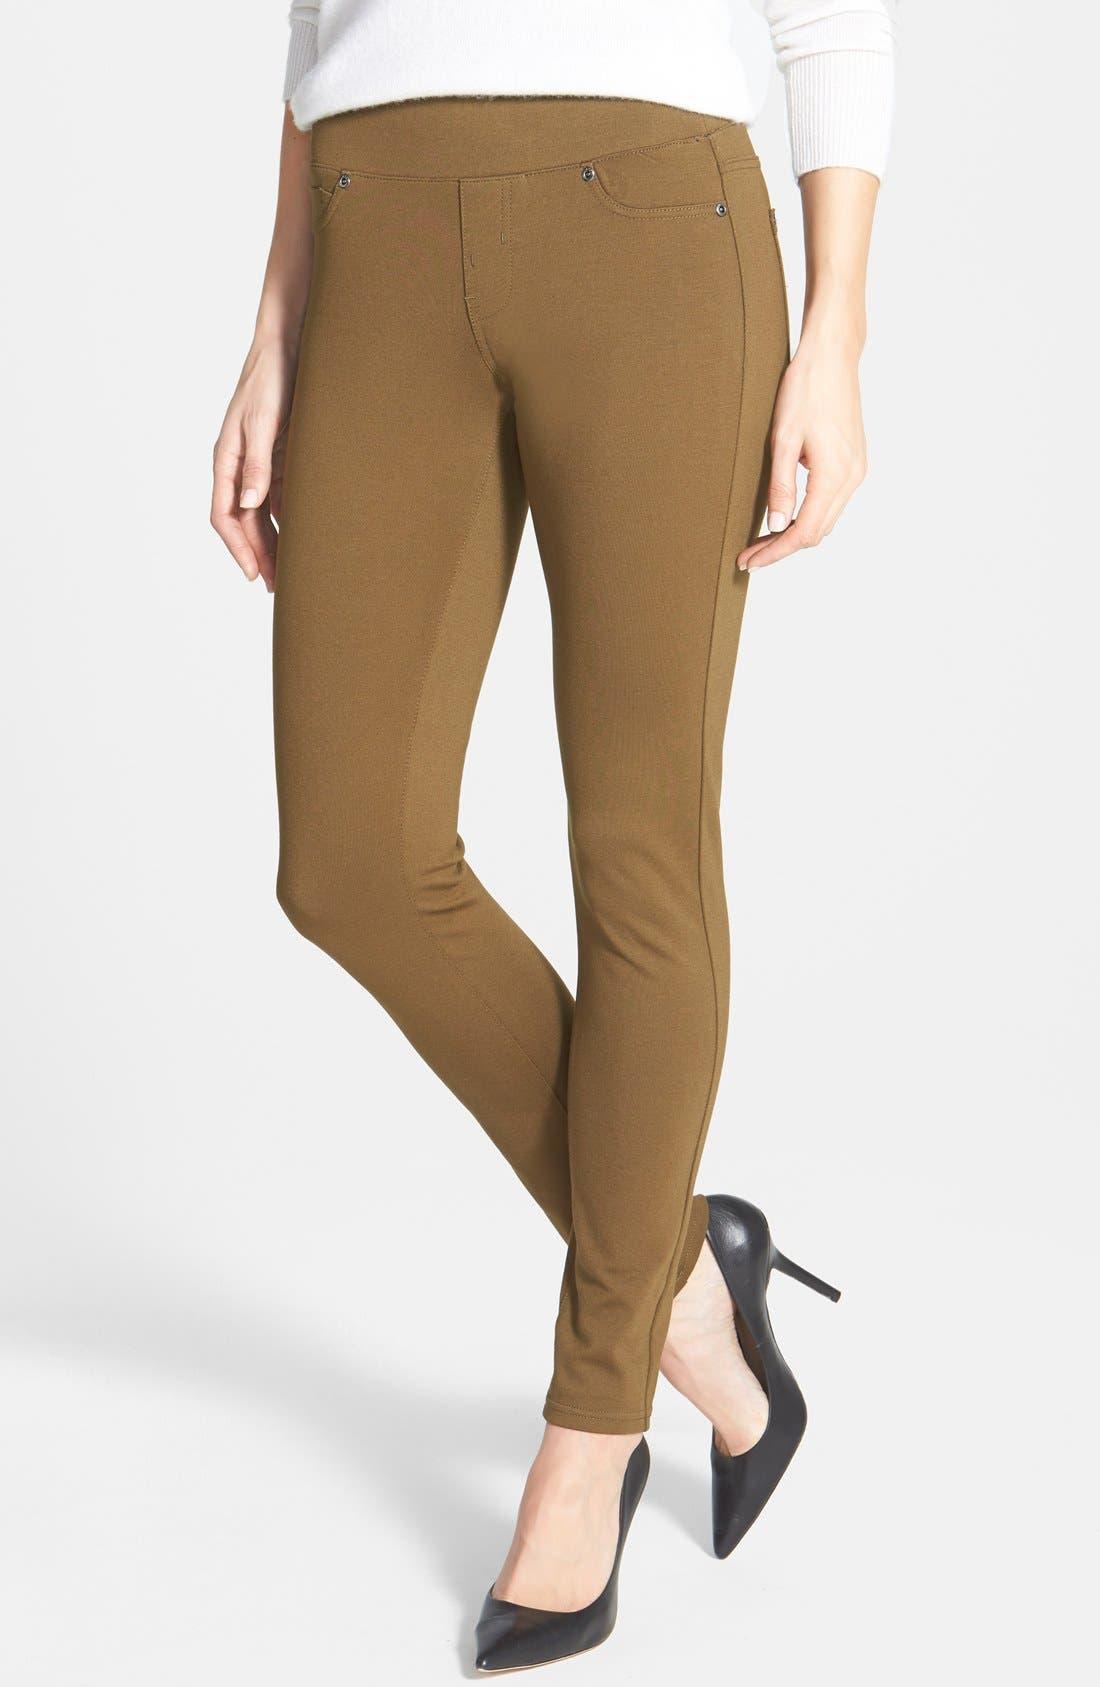 Alternate Image 1 Selected - Liverpool Jeans Company 'Sienna' Ponte Leggings